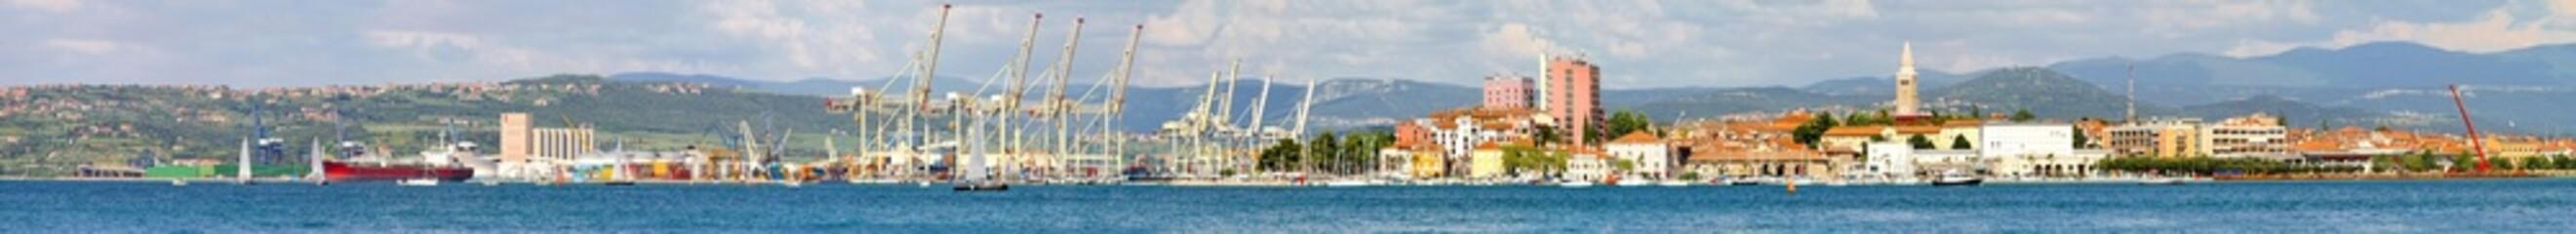 Koper port